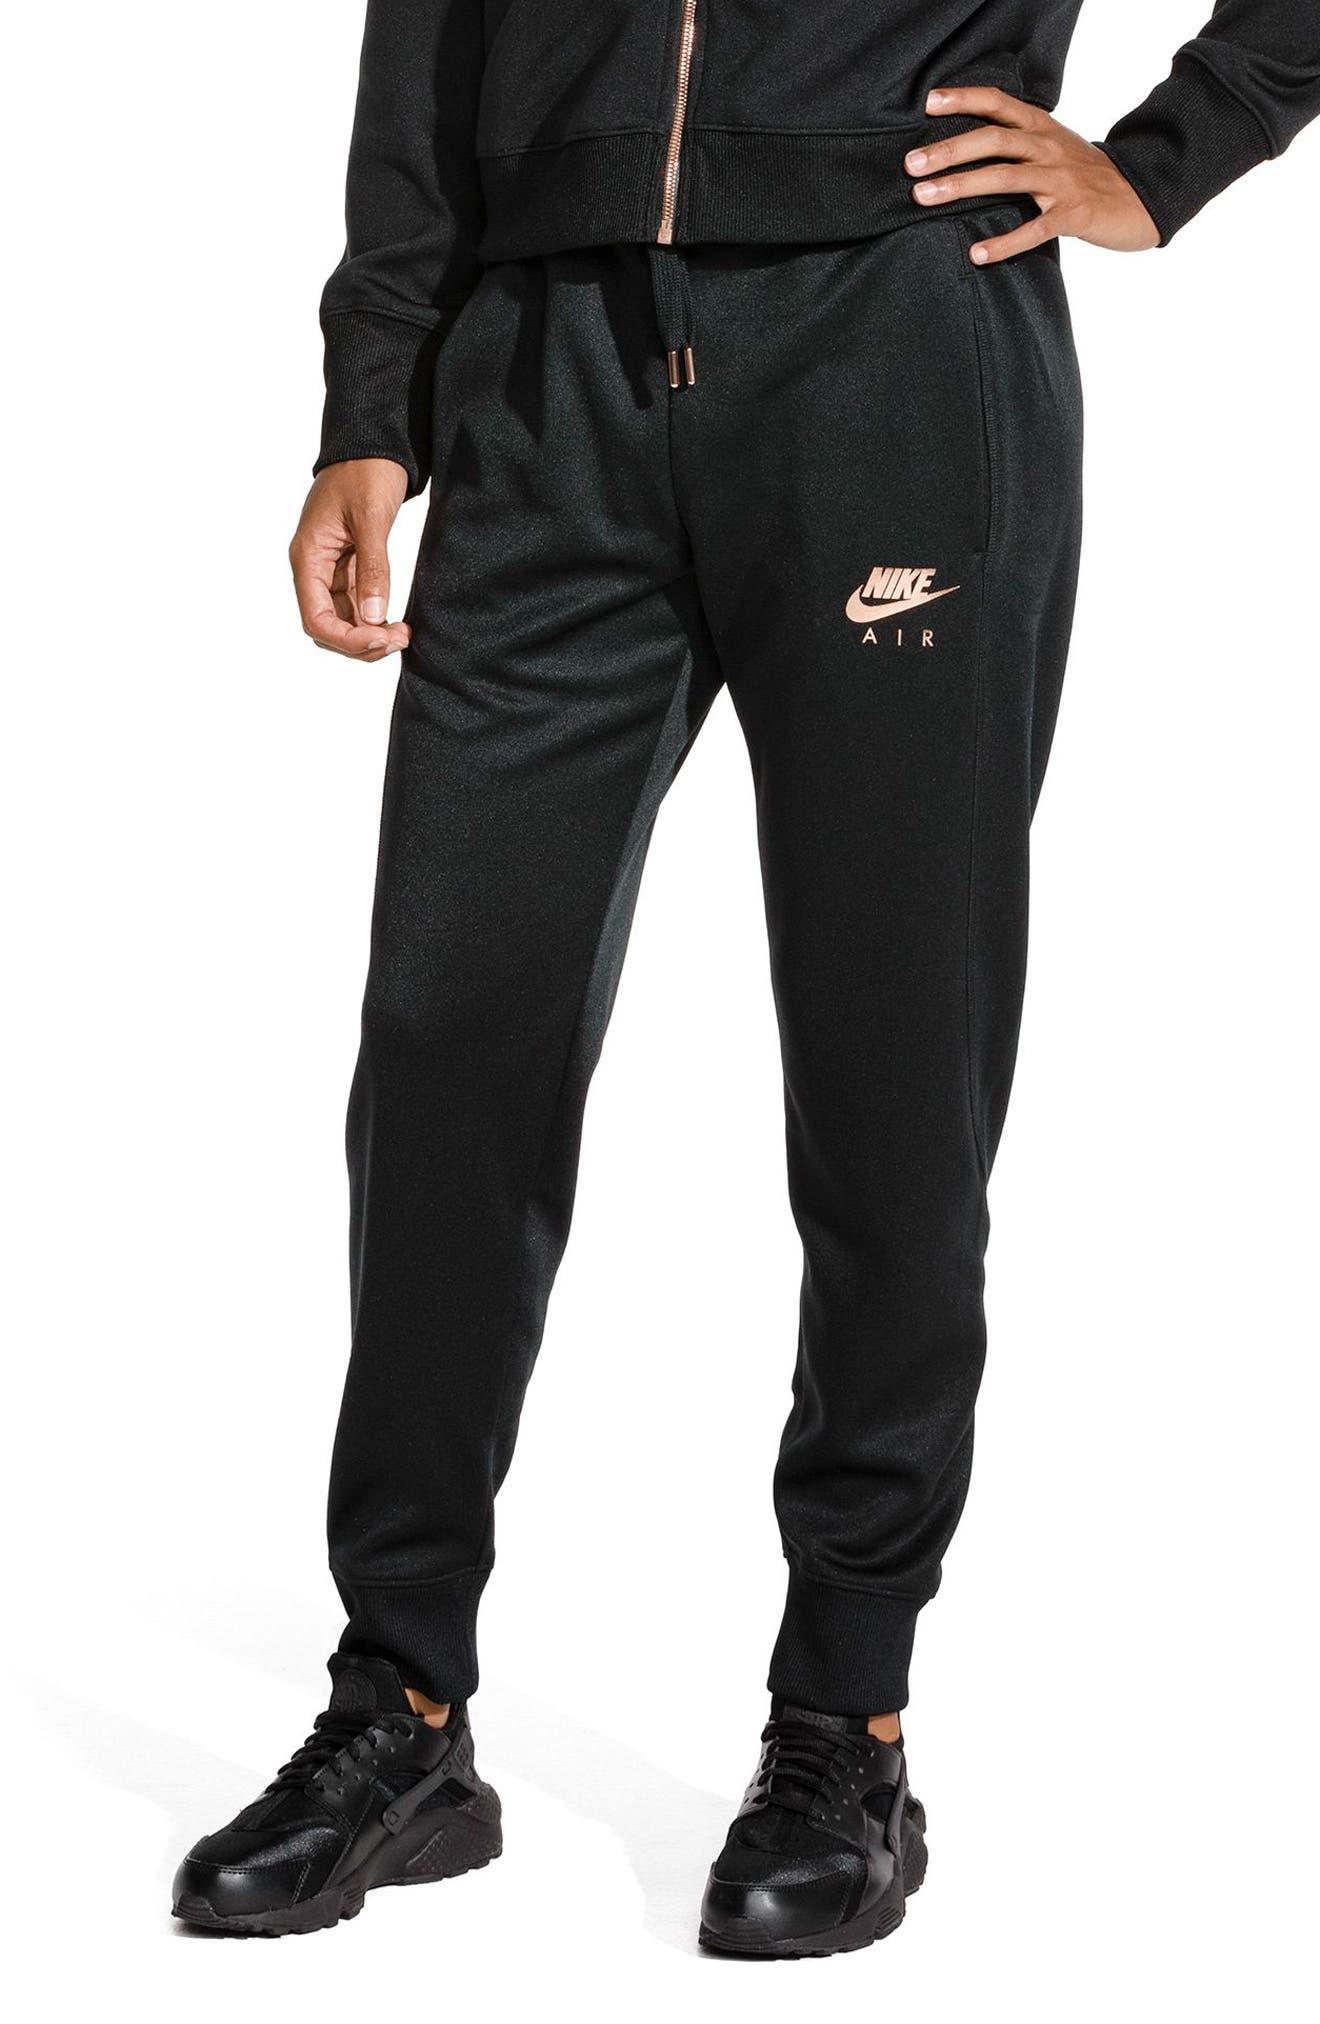 Sportswear Air Jogger Pants,                             Main thumbnail 1, color,                             010